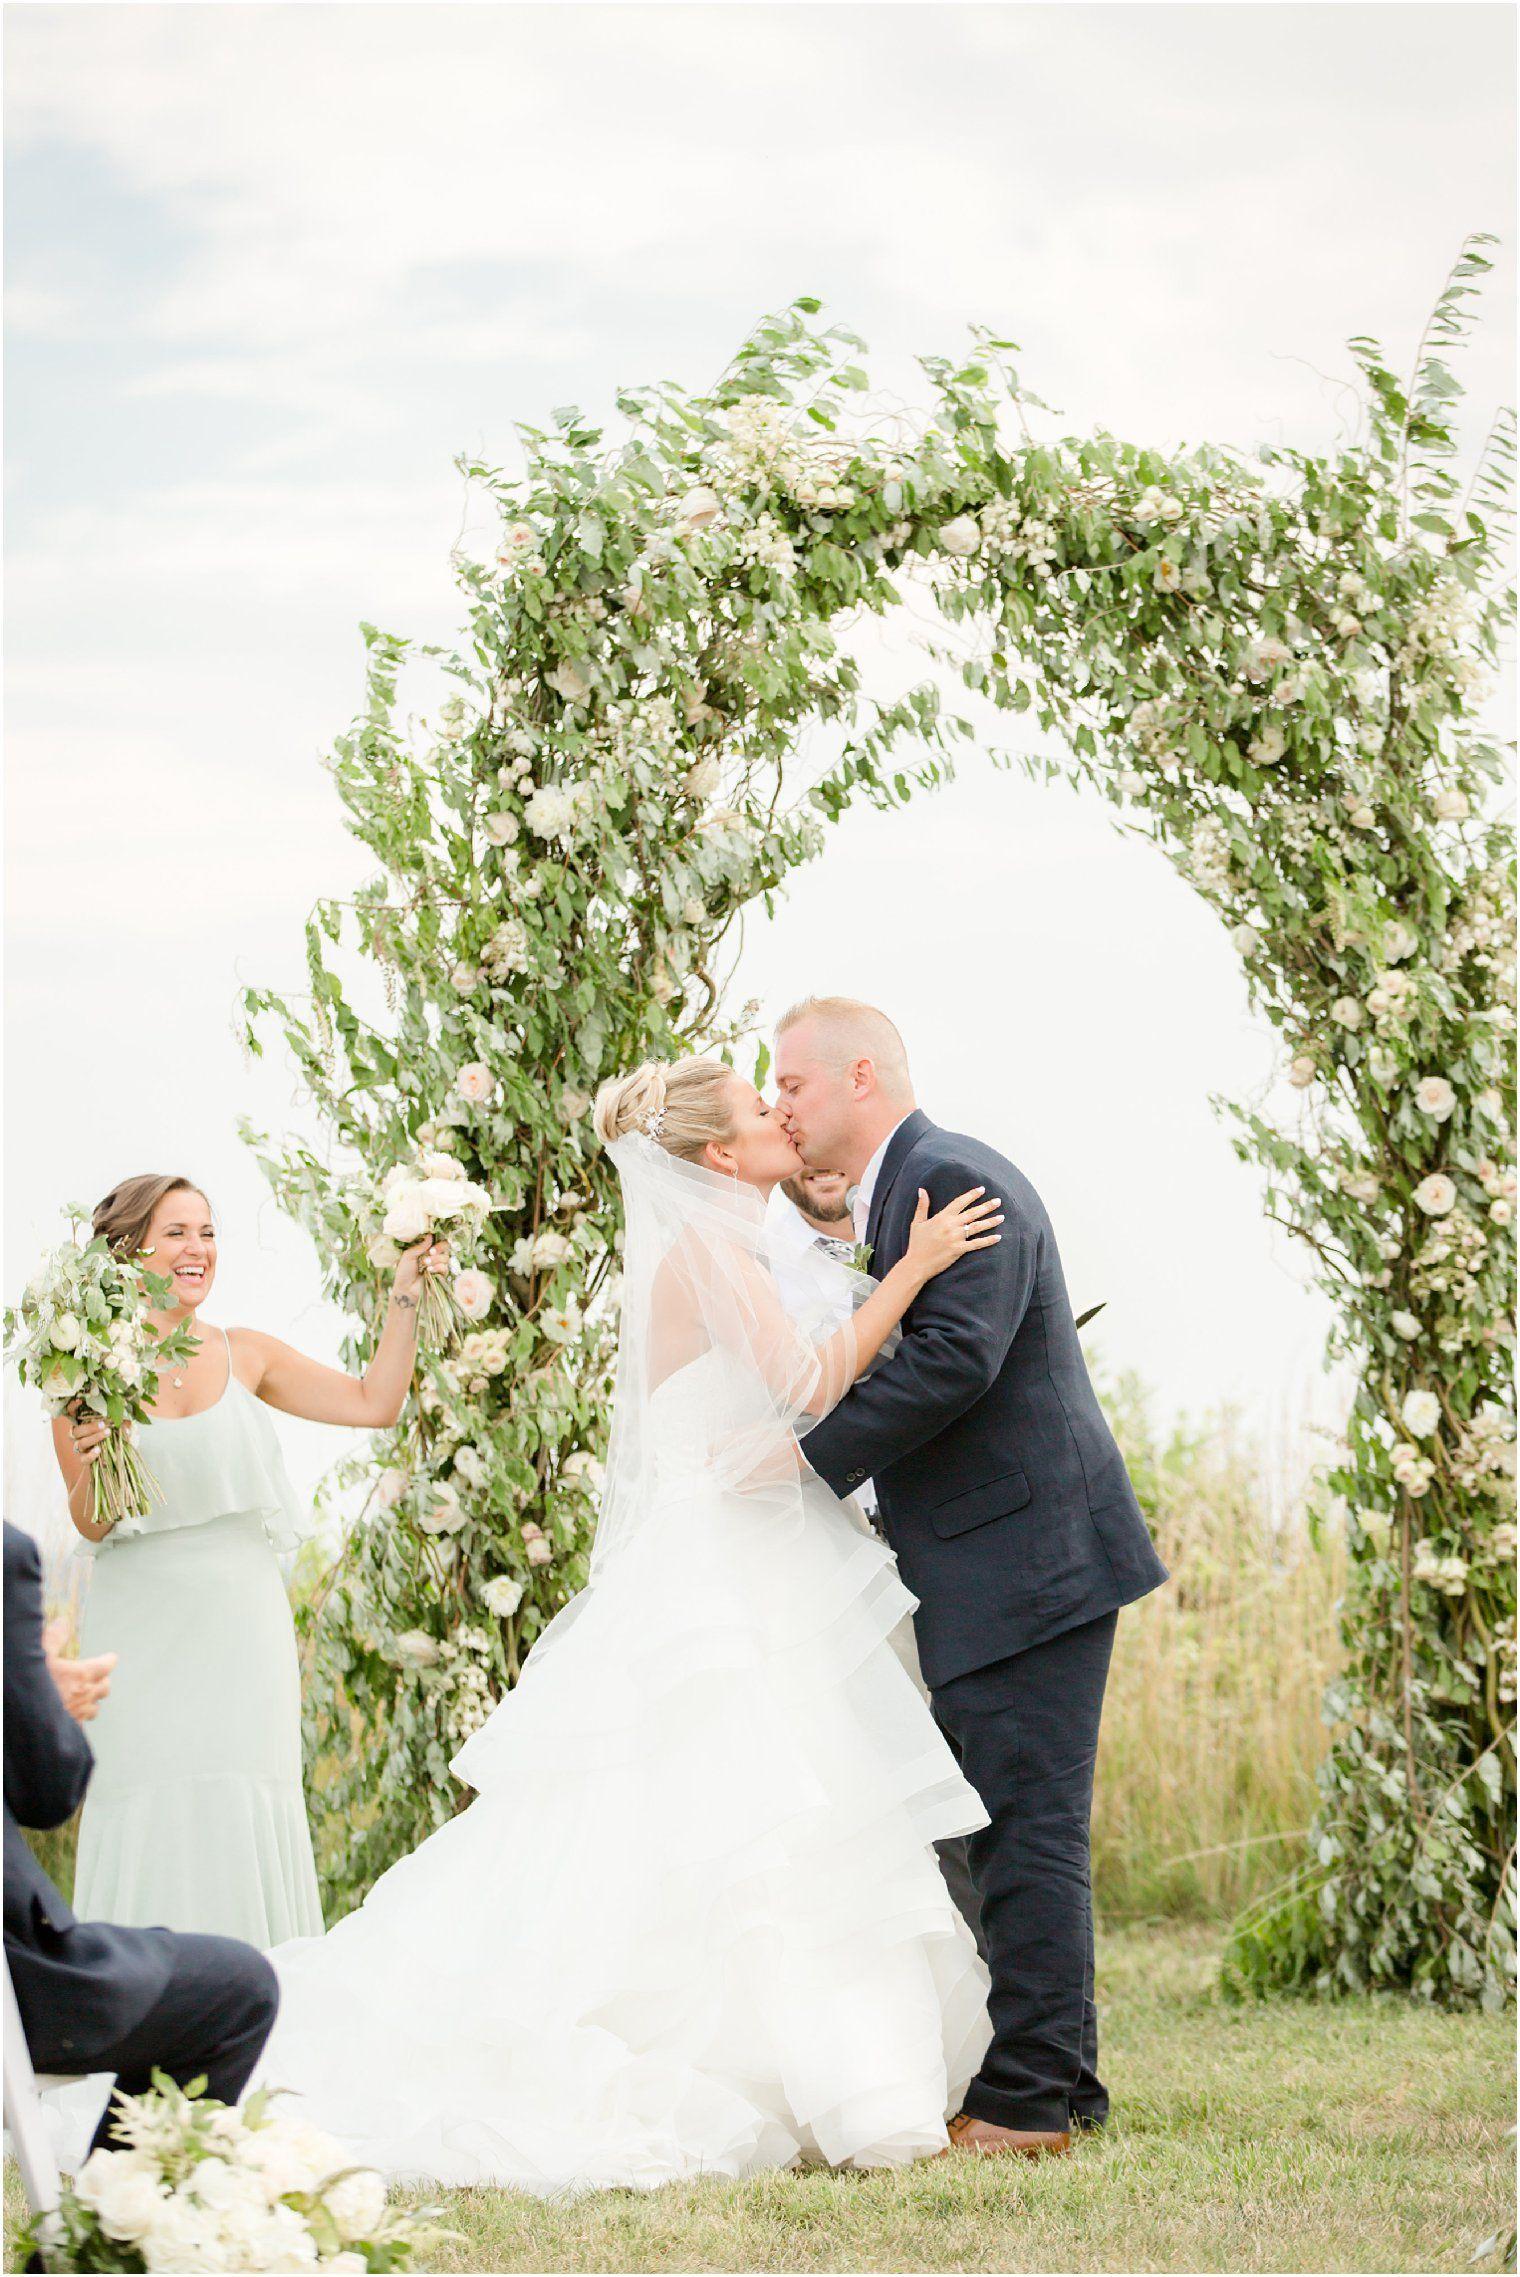 Outdoor Wedding Venues NJ | Outdoor wedding venues ...